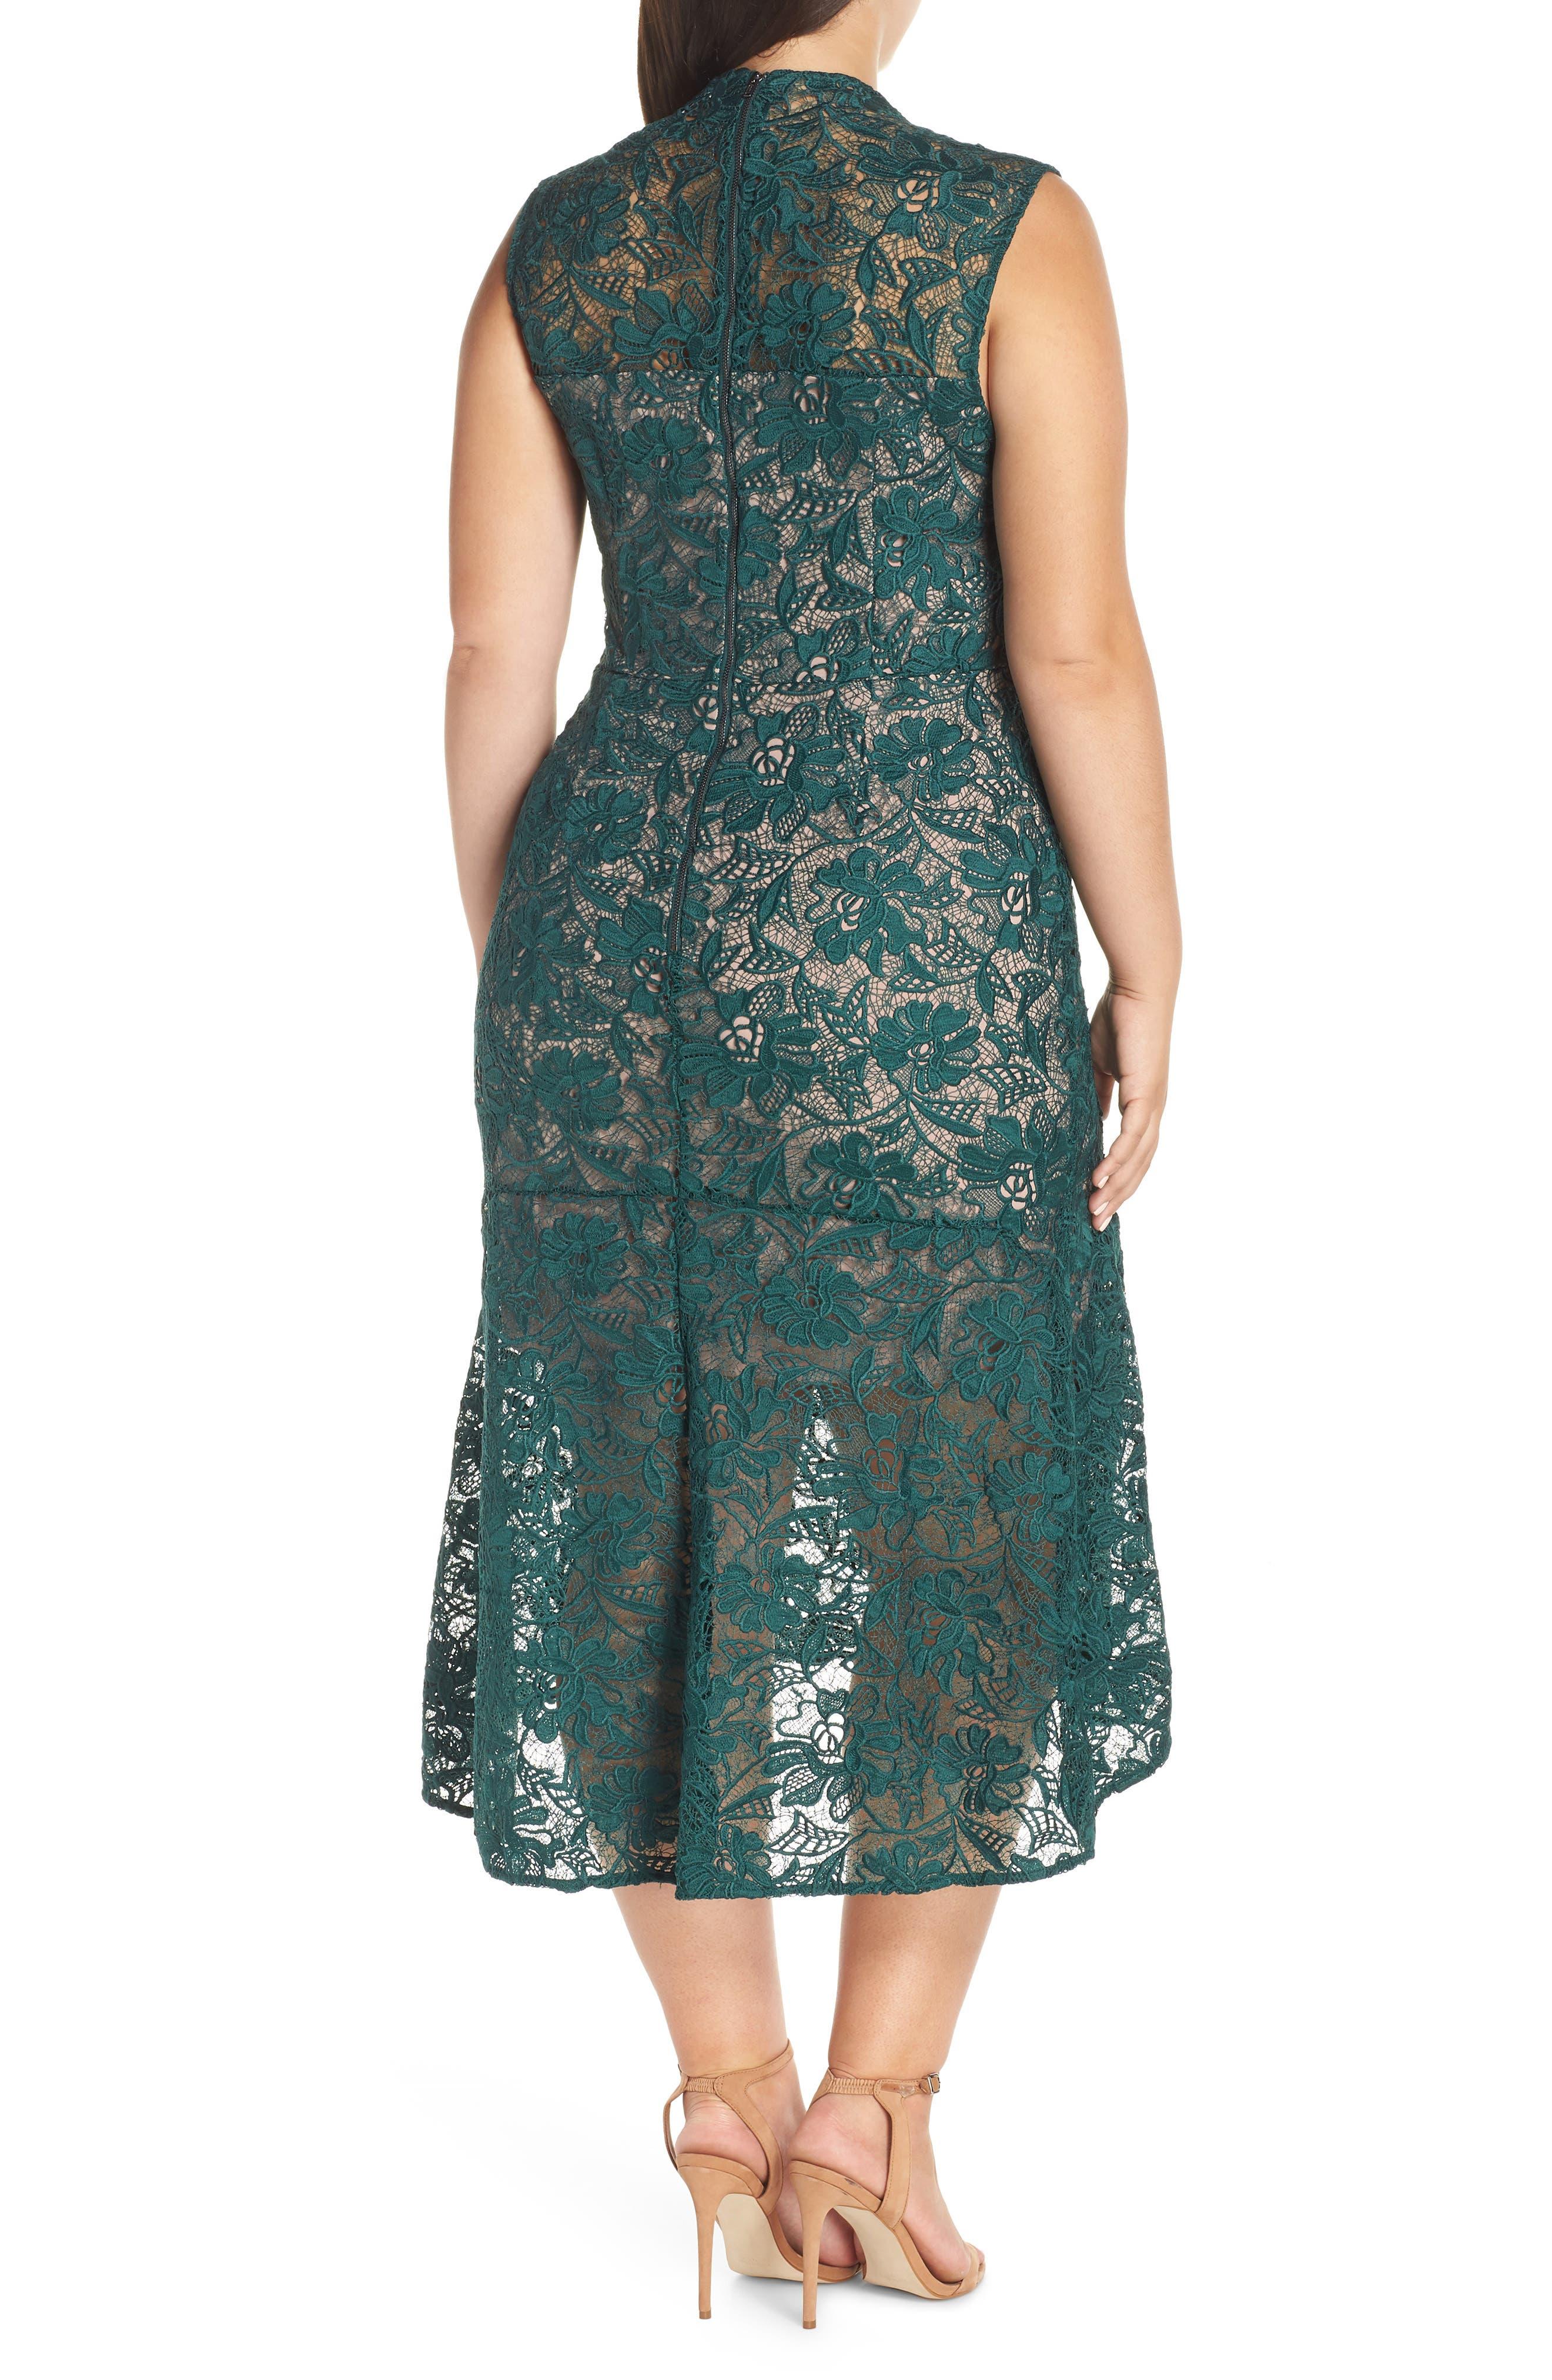 Chesea28 Lace Mock Neck Midi Dress,                             Alternate thumbnail 2, color,                             GREEN PARK